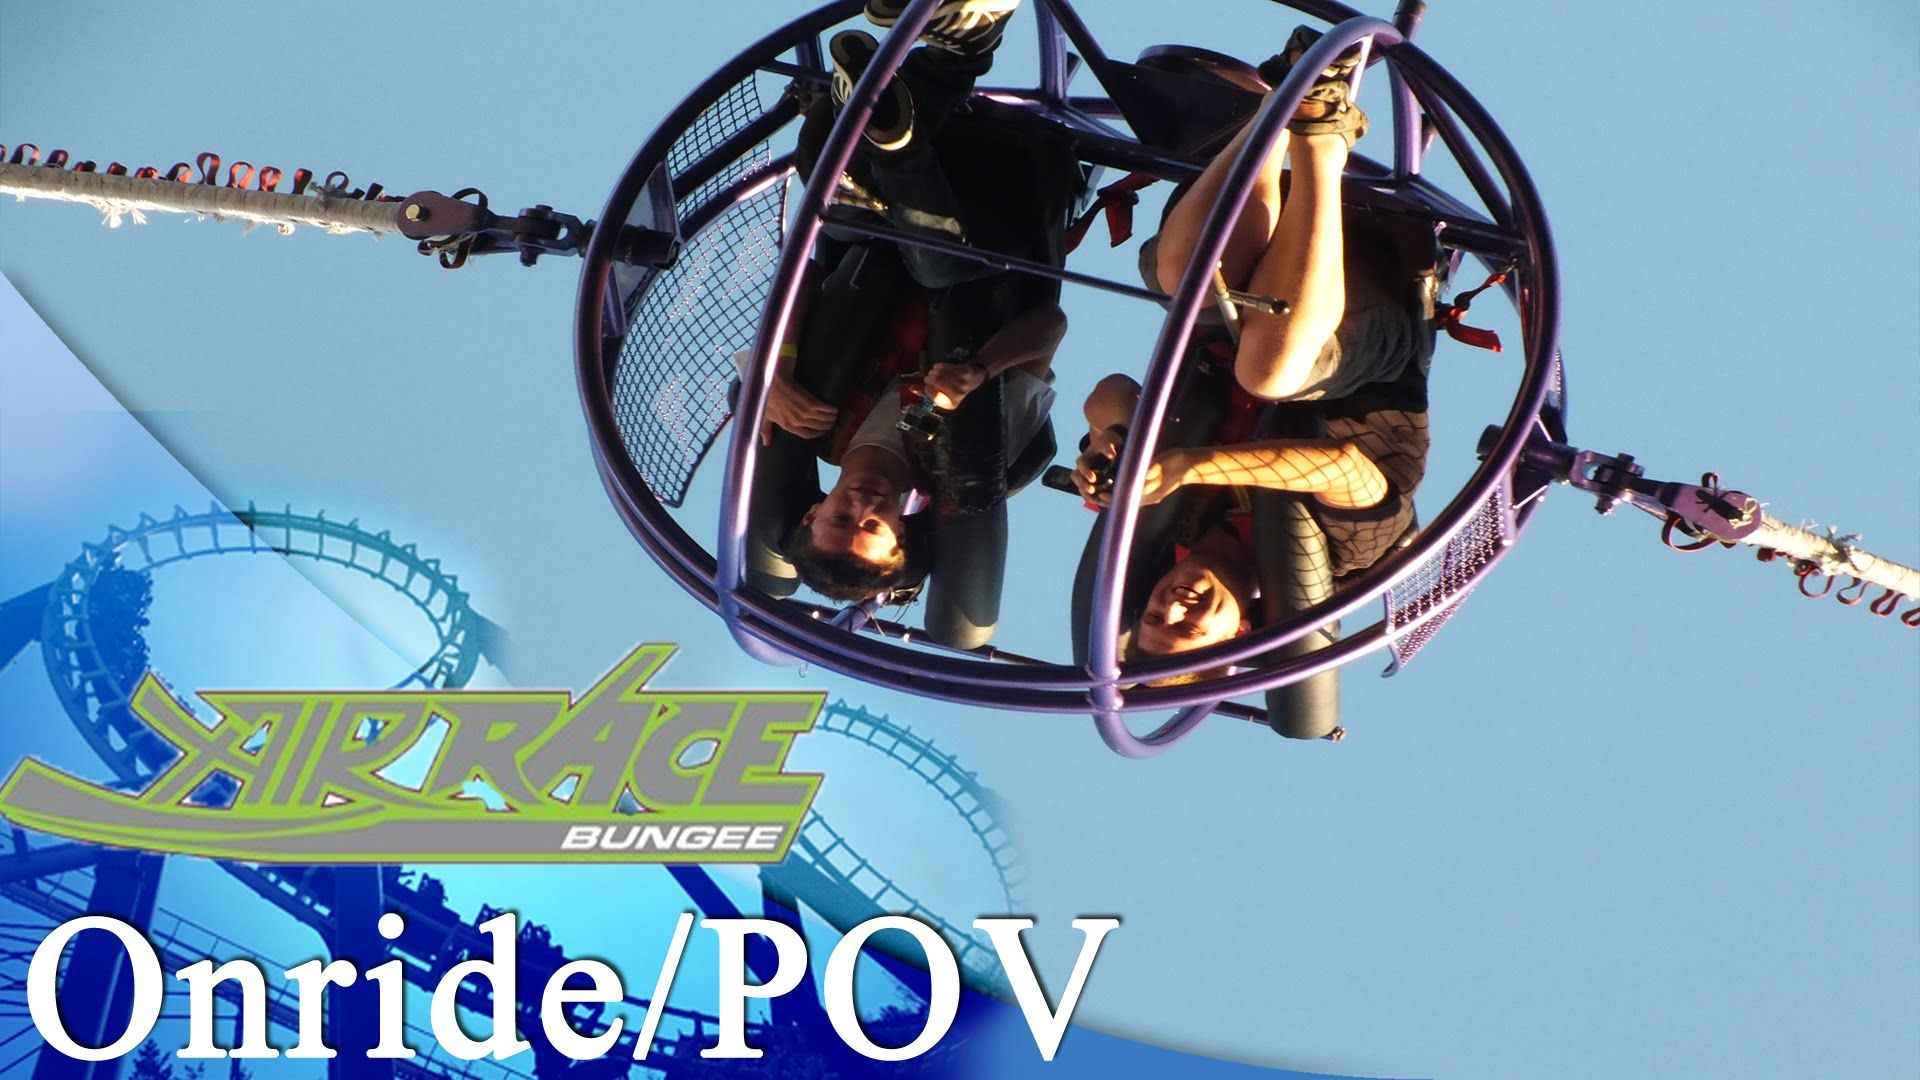 Konga Küchenmeister ~ Air race bungee on offride mo de vries tilburgse kermis